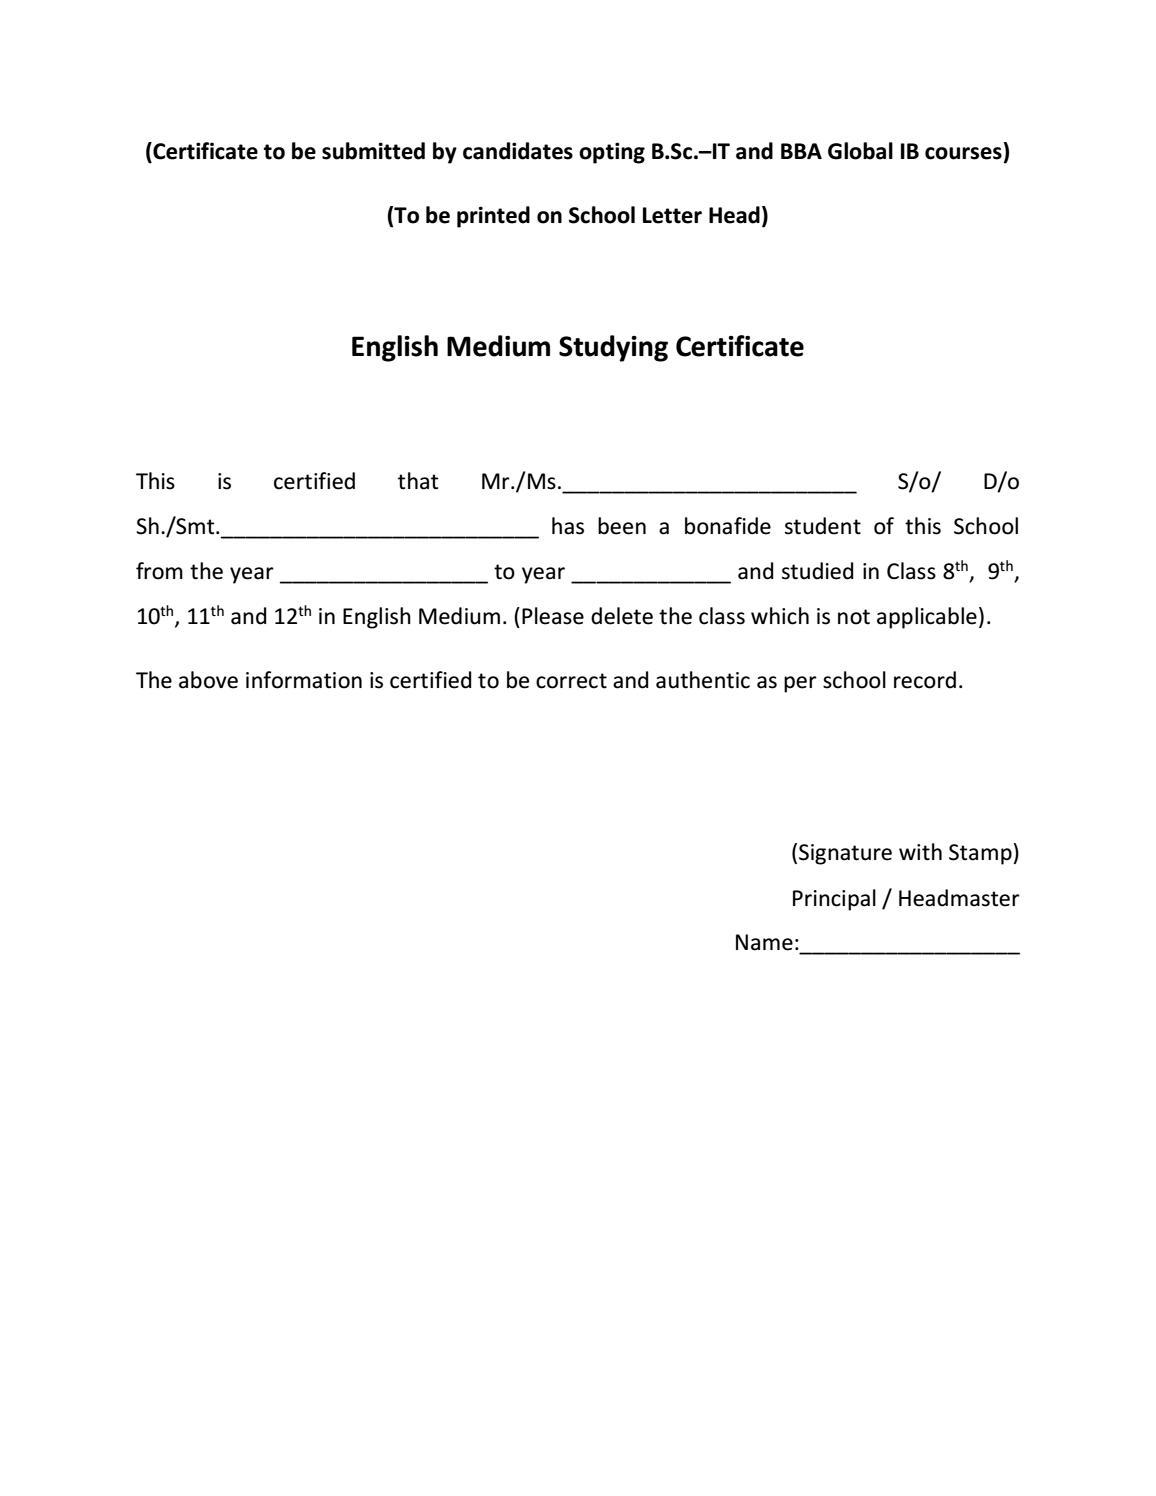 English Medium Studying Certificate Proforma For